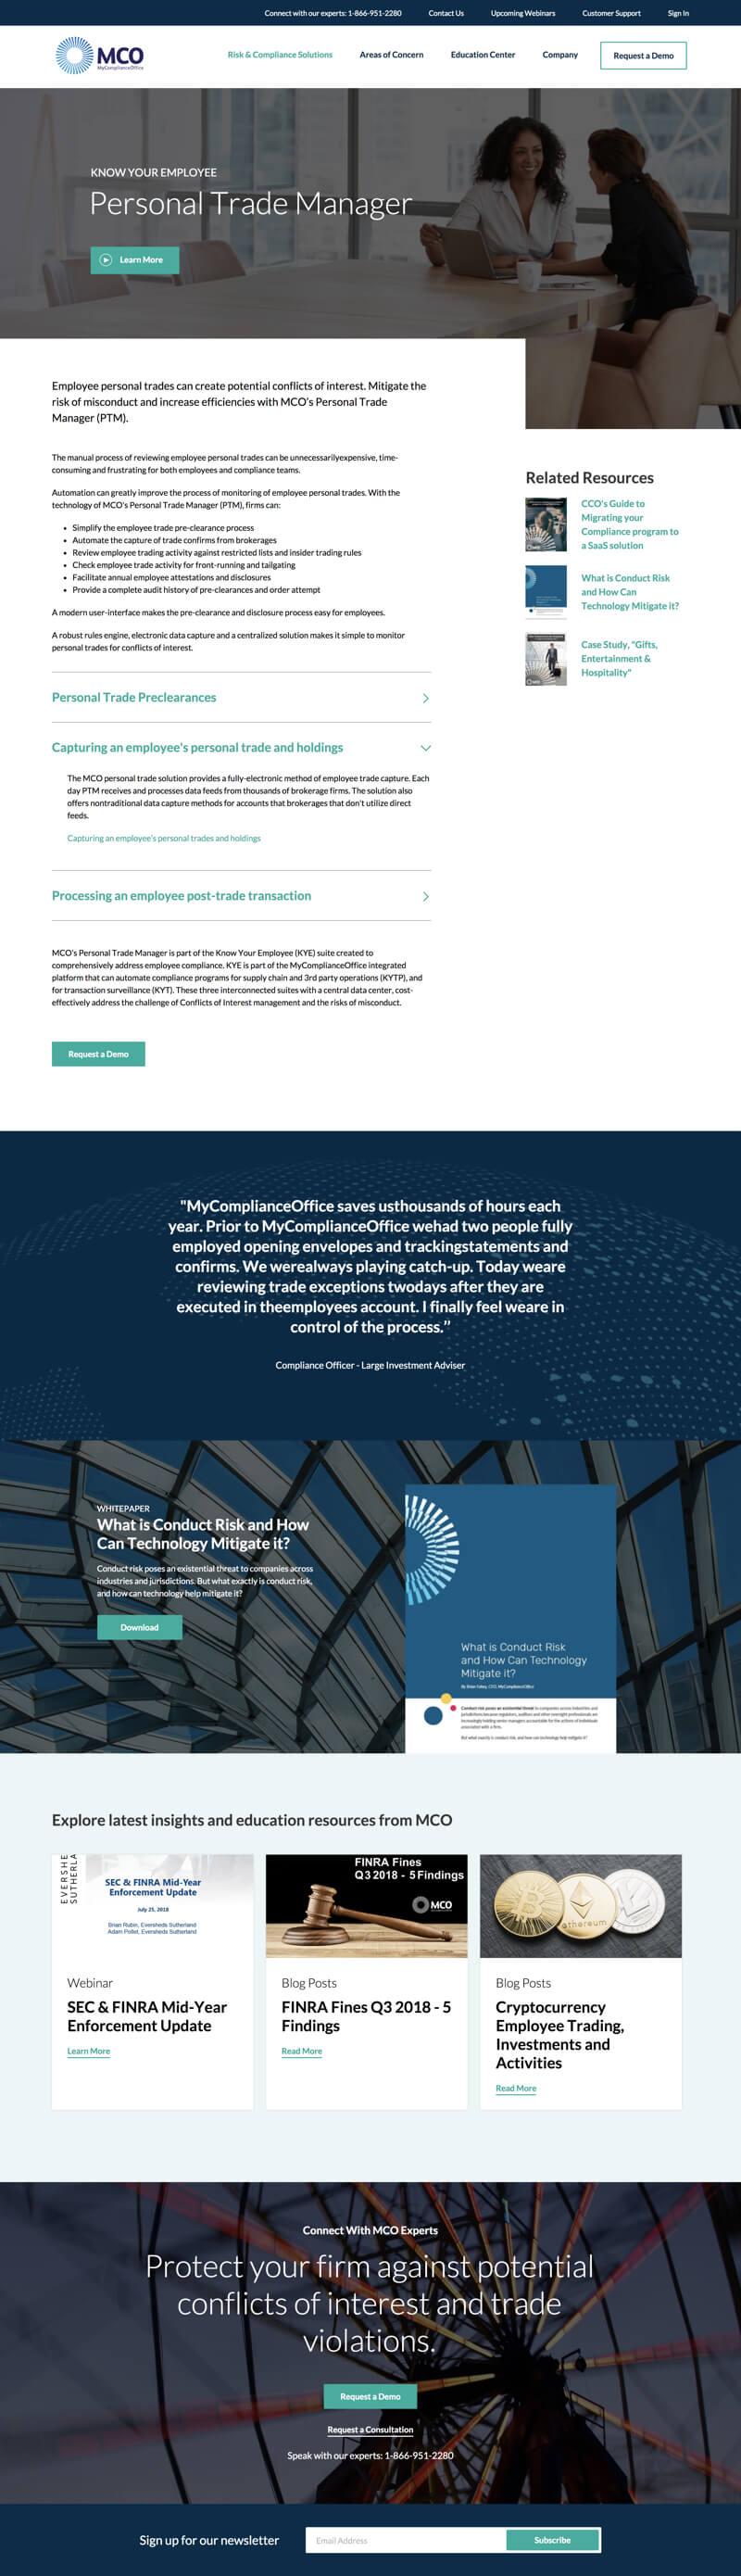 MyComplianceOffice website design